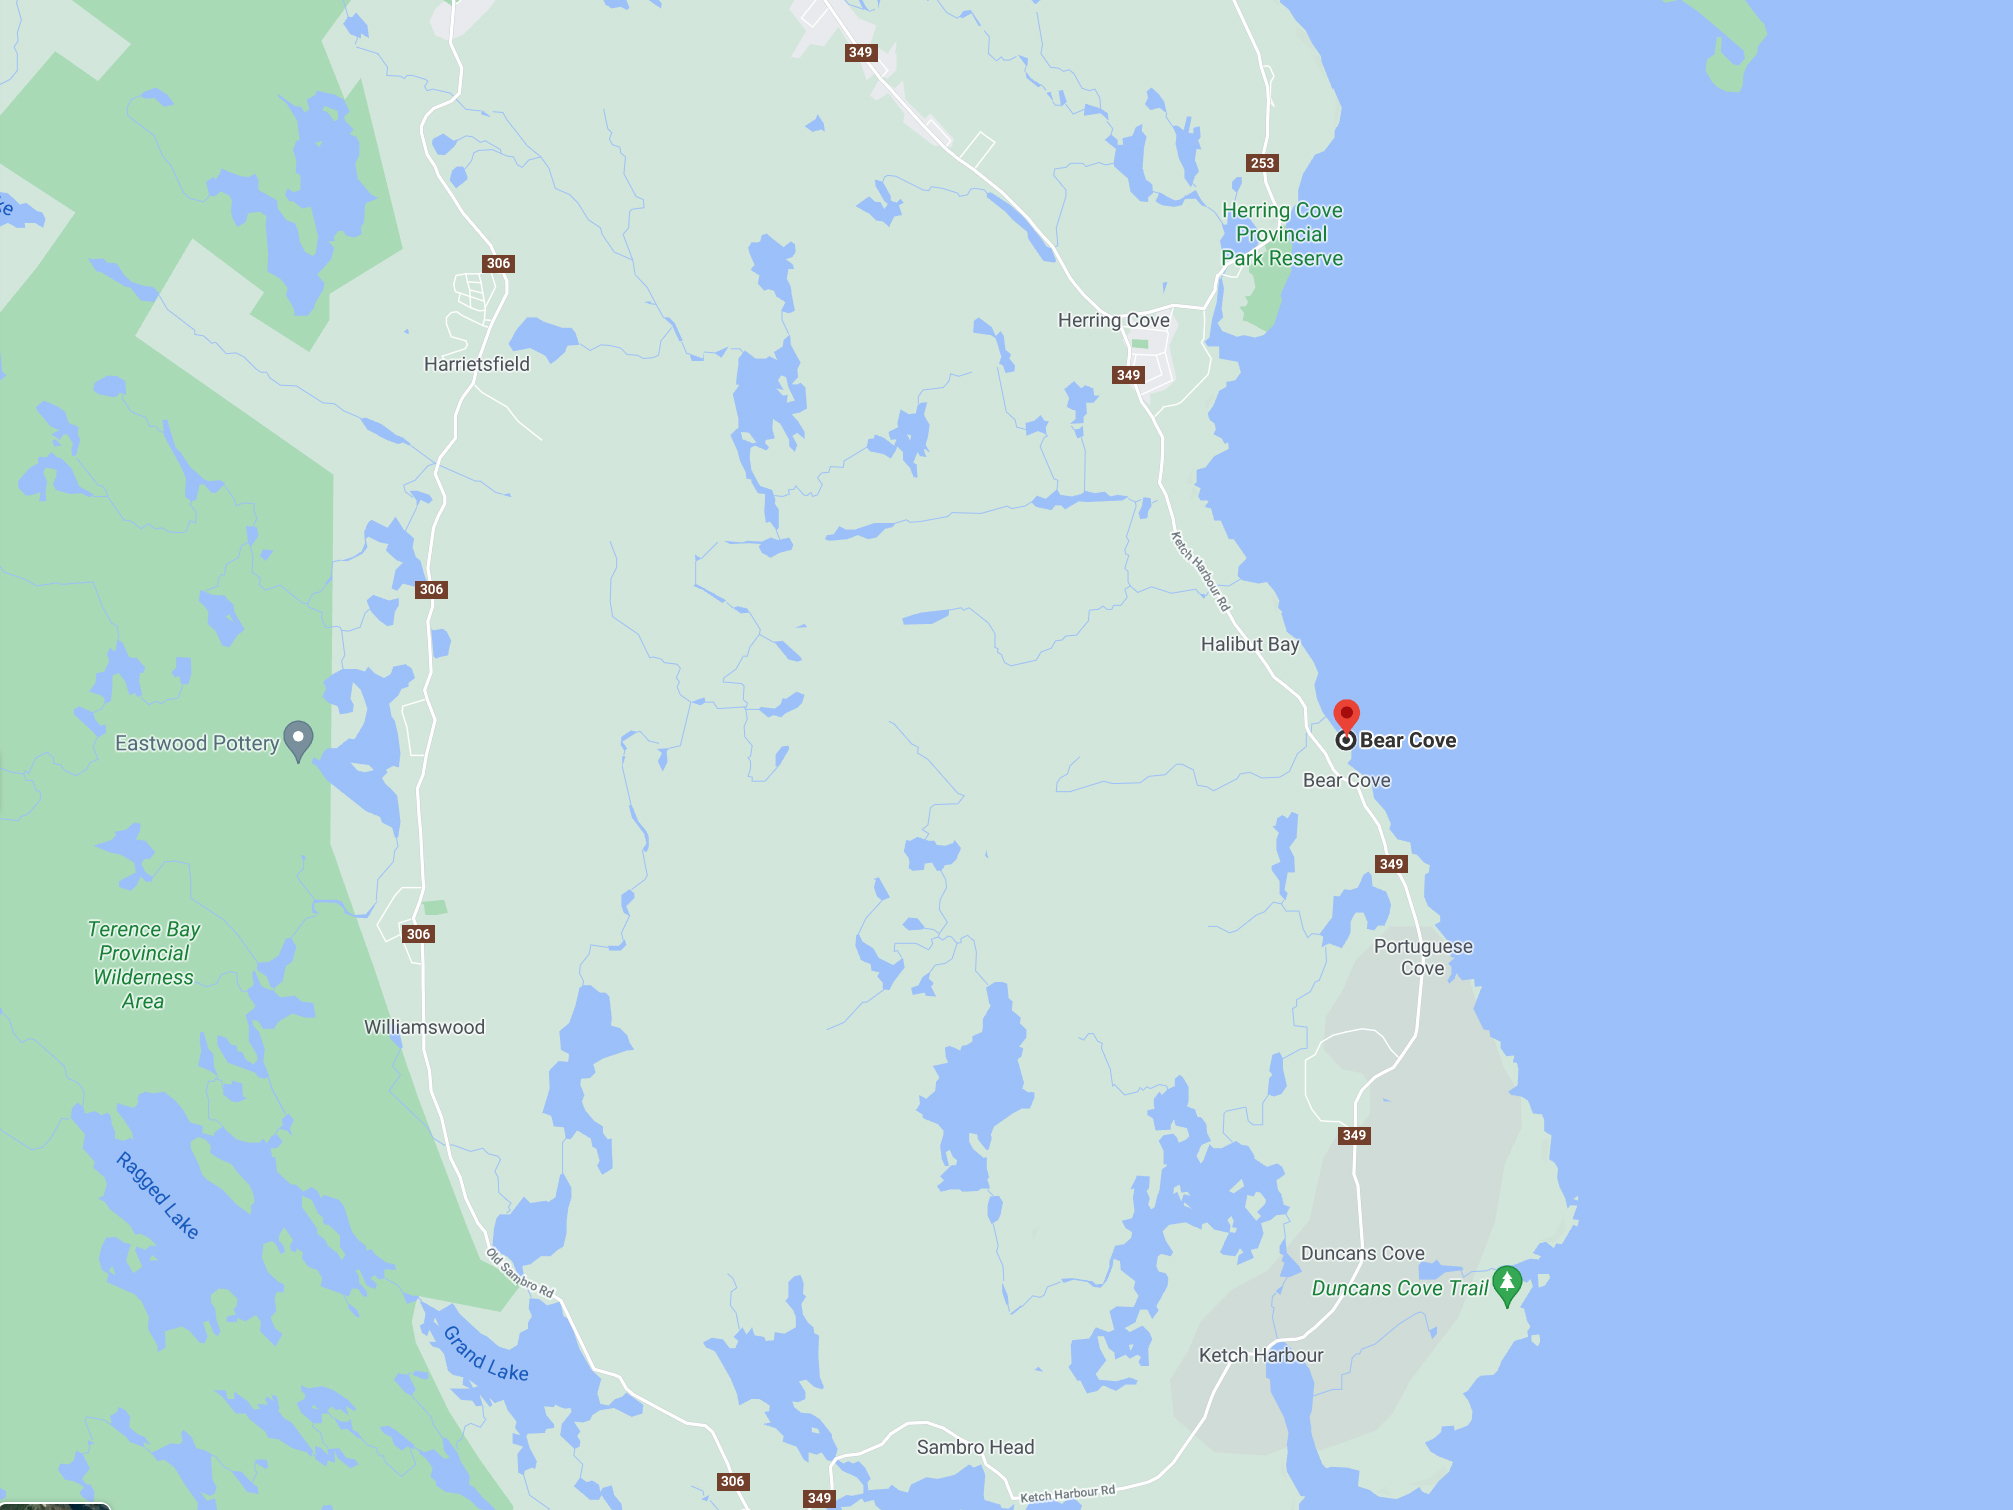 Bear Cove Scuba Diving Site On Terrence Bay In The Halifax Regional Municipality, Nova Scotia, Canada